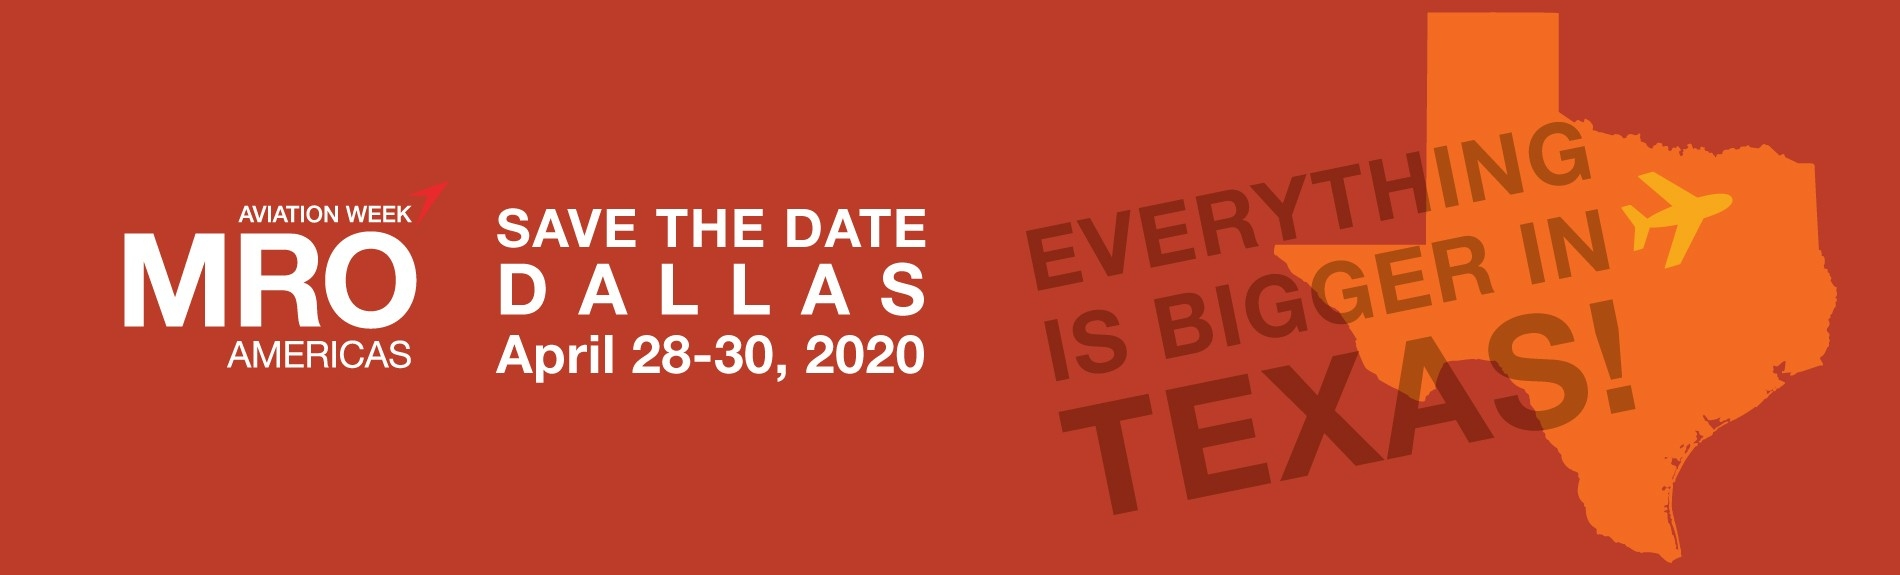 Mro Americas 2020  Usaf Julian Date Calendar 2020 Printable